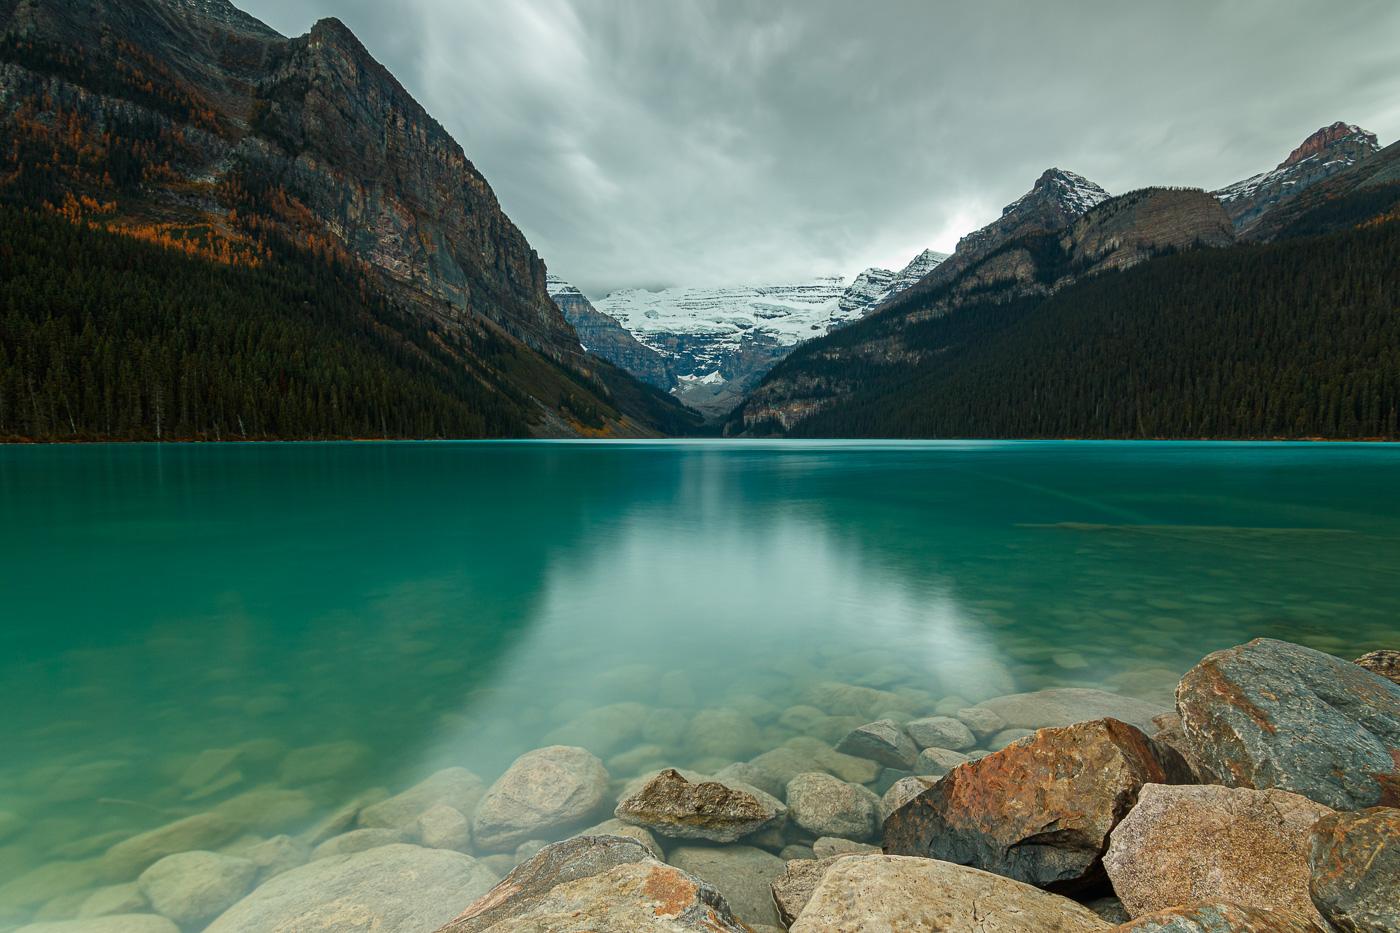 Lake Louise with ND filter - Paisatges de Nord-Amèrica - Raül Carmona - Fotografia, Fotografia d'estudi, esdeveniments i Natura